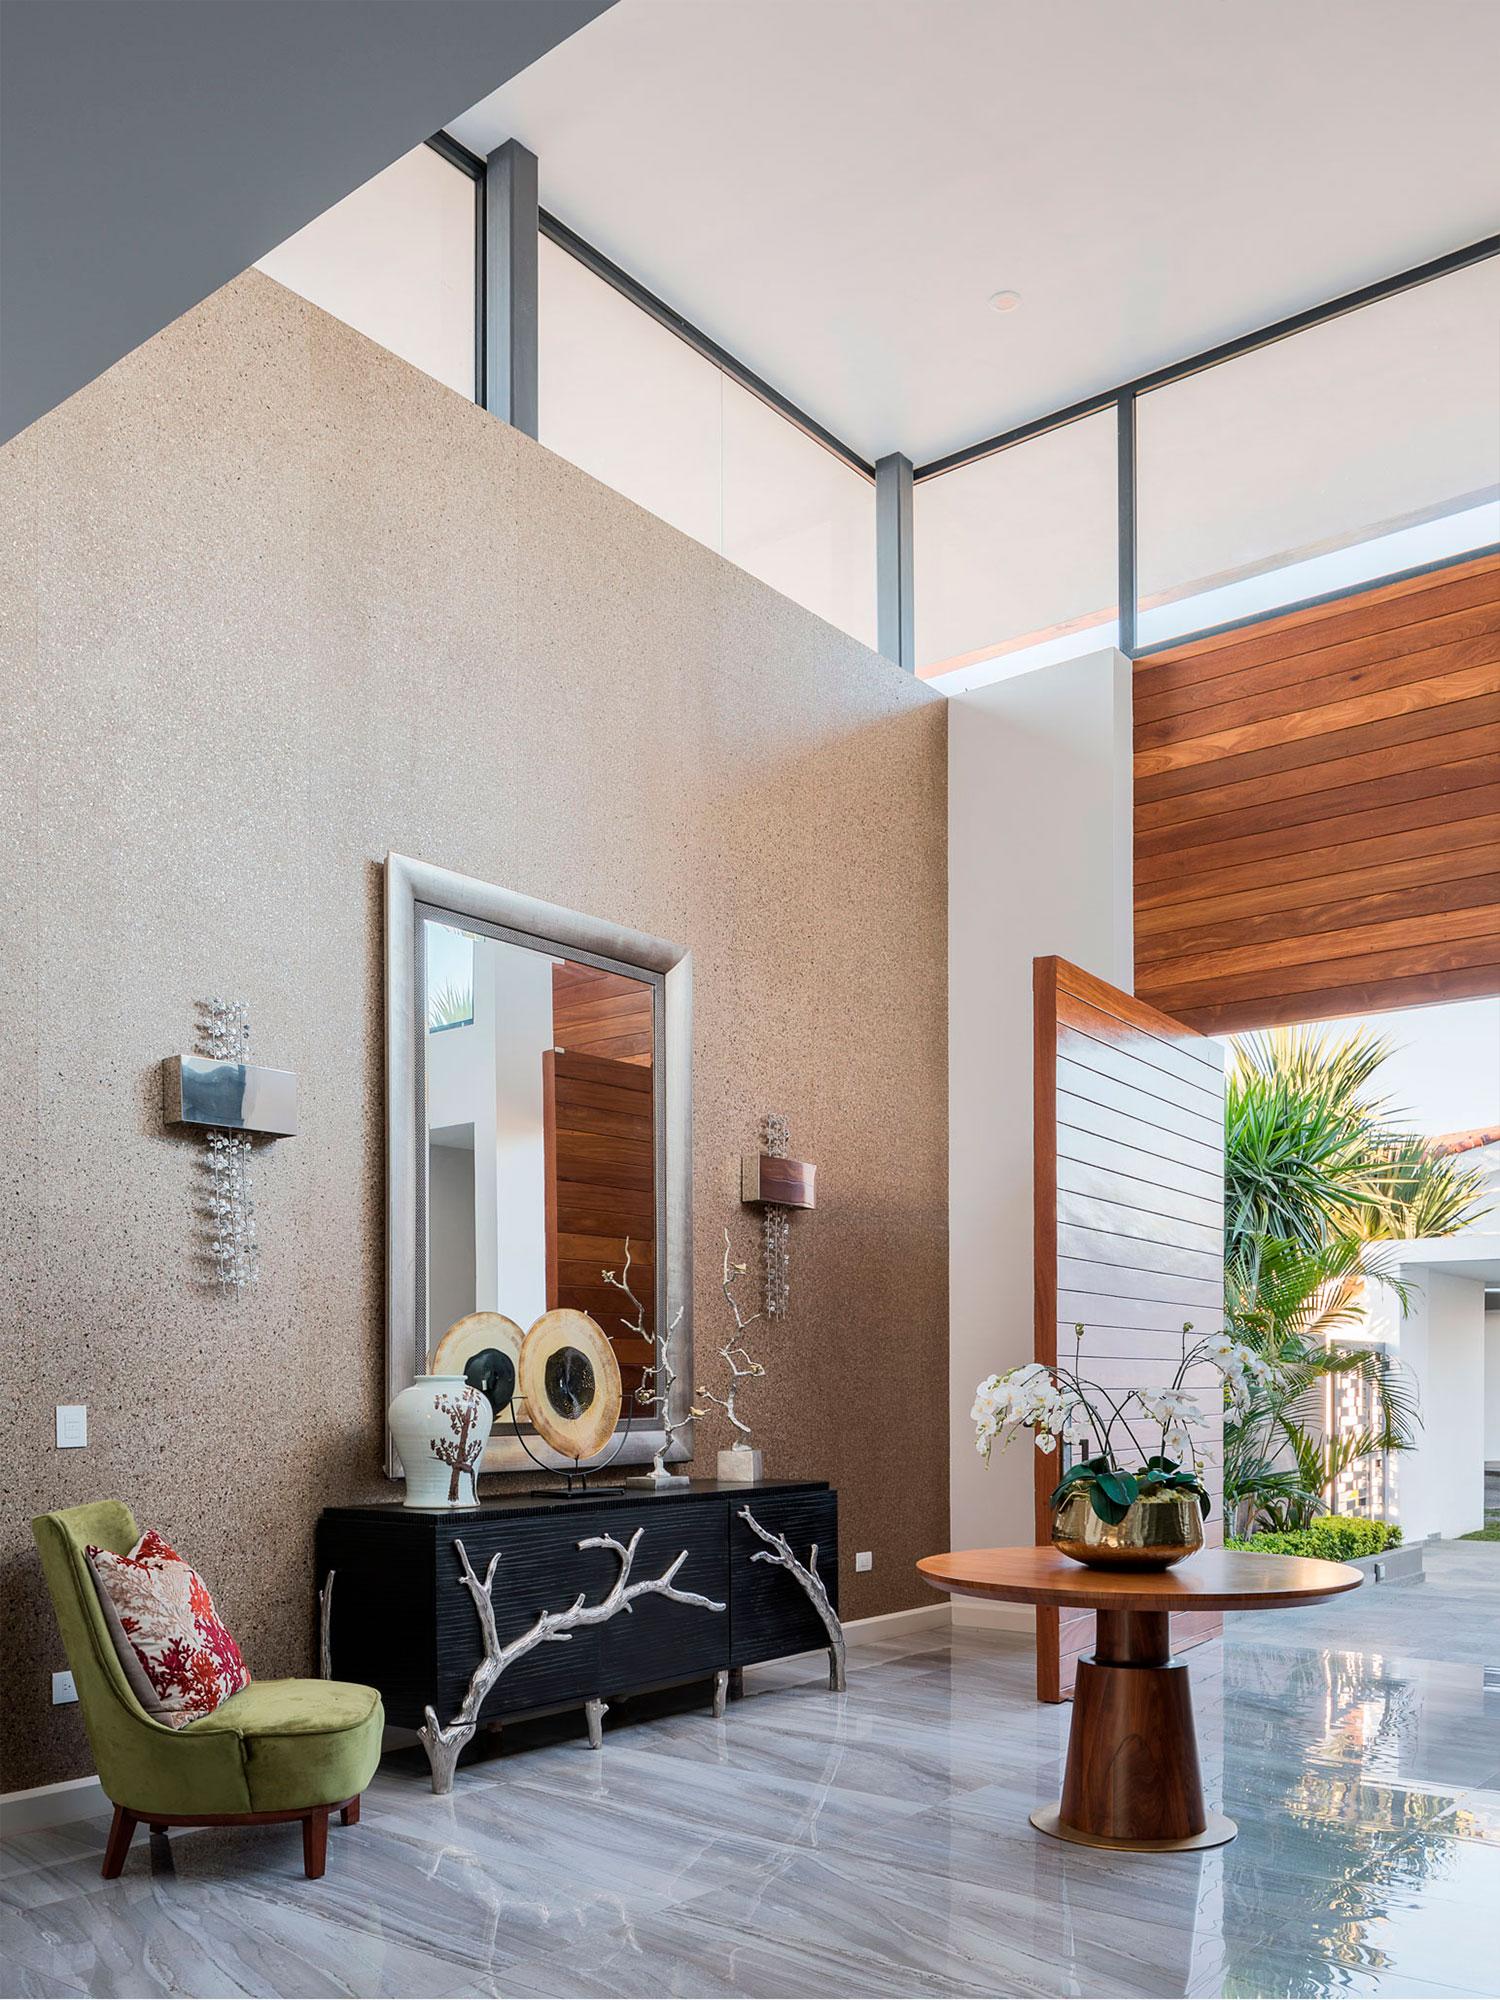 Ordaz-Coppel-Arquitectos-AV-House.jpg